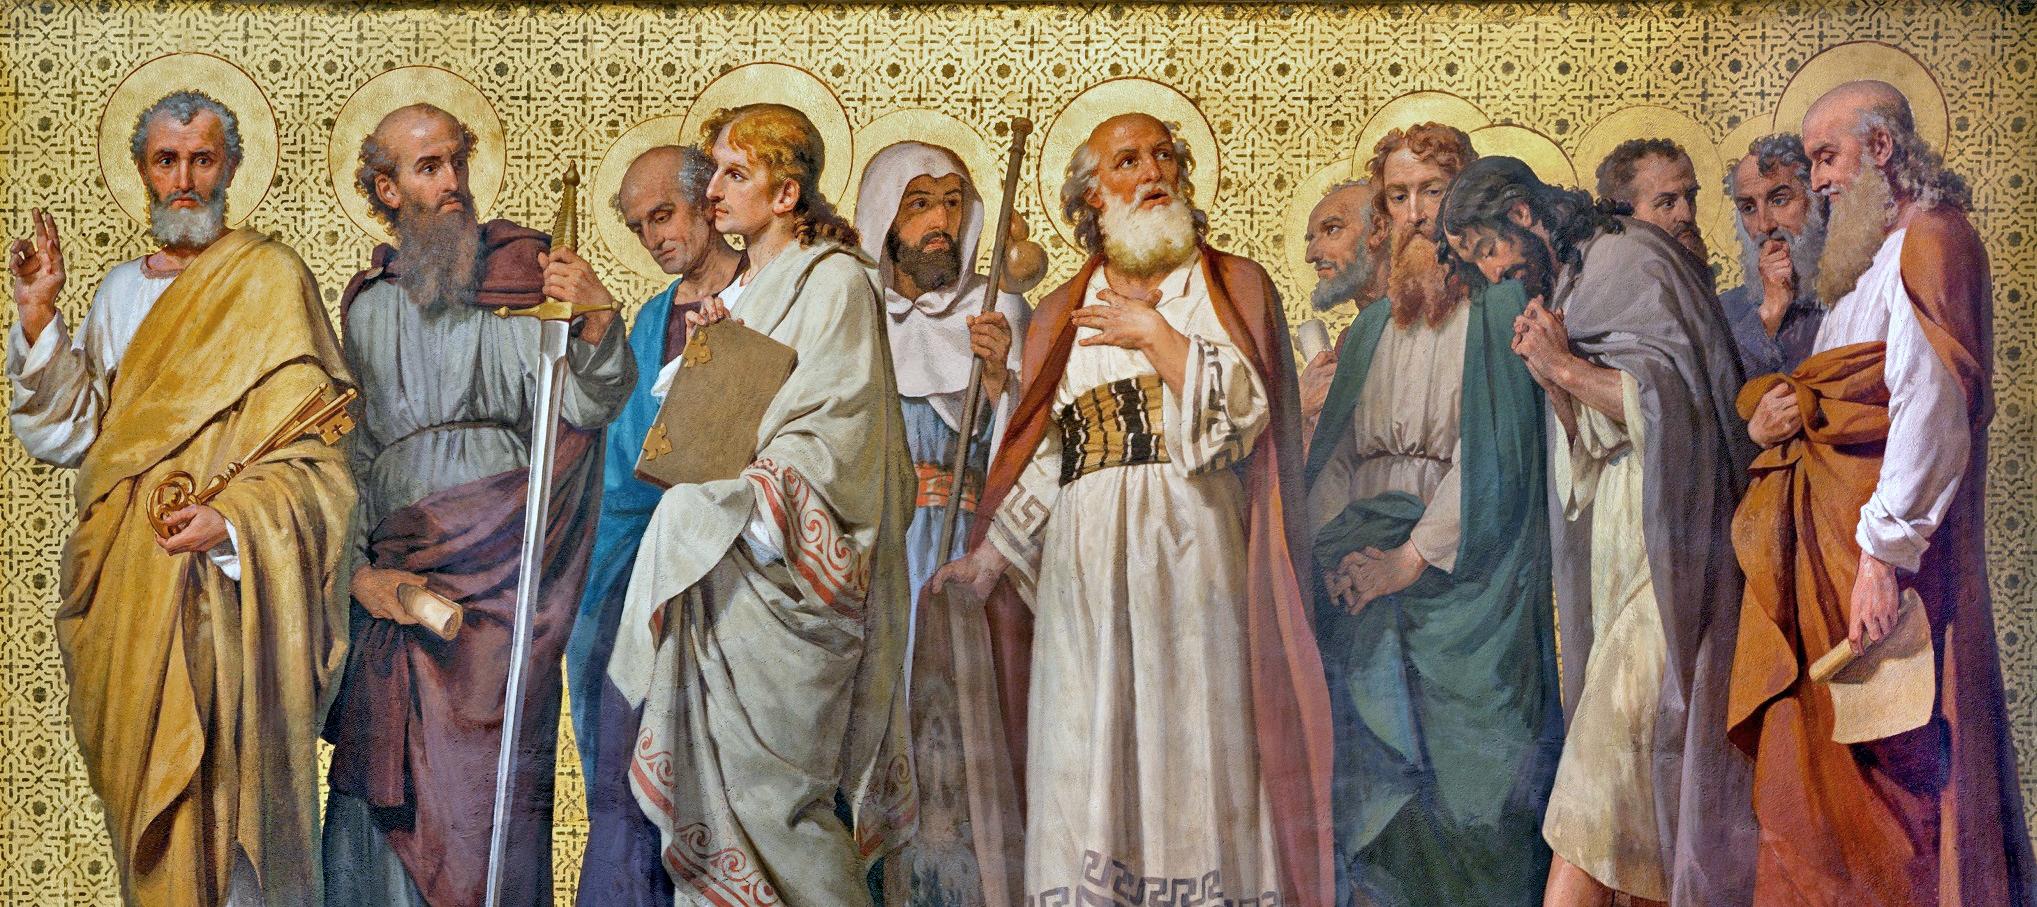 TURIN, ITALY - MARCH 15, 2017: The symbolic fresco of Twelve apo